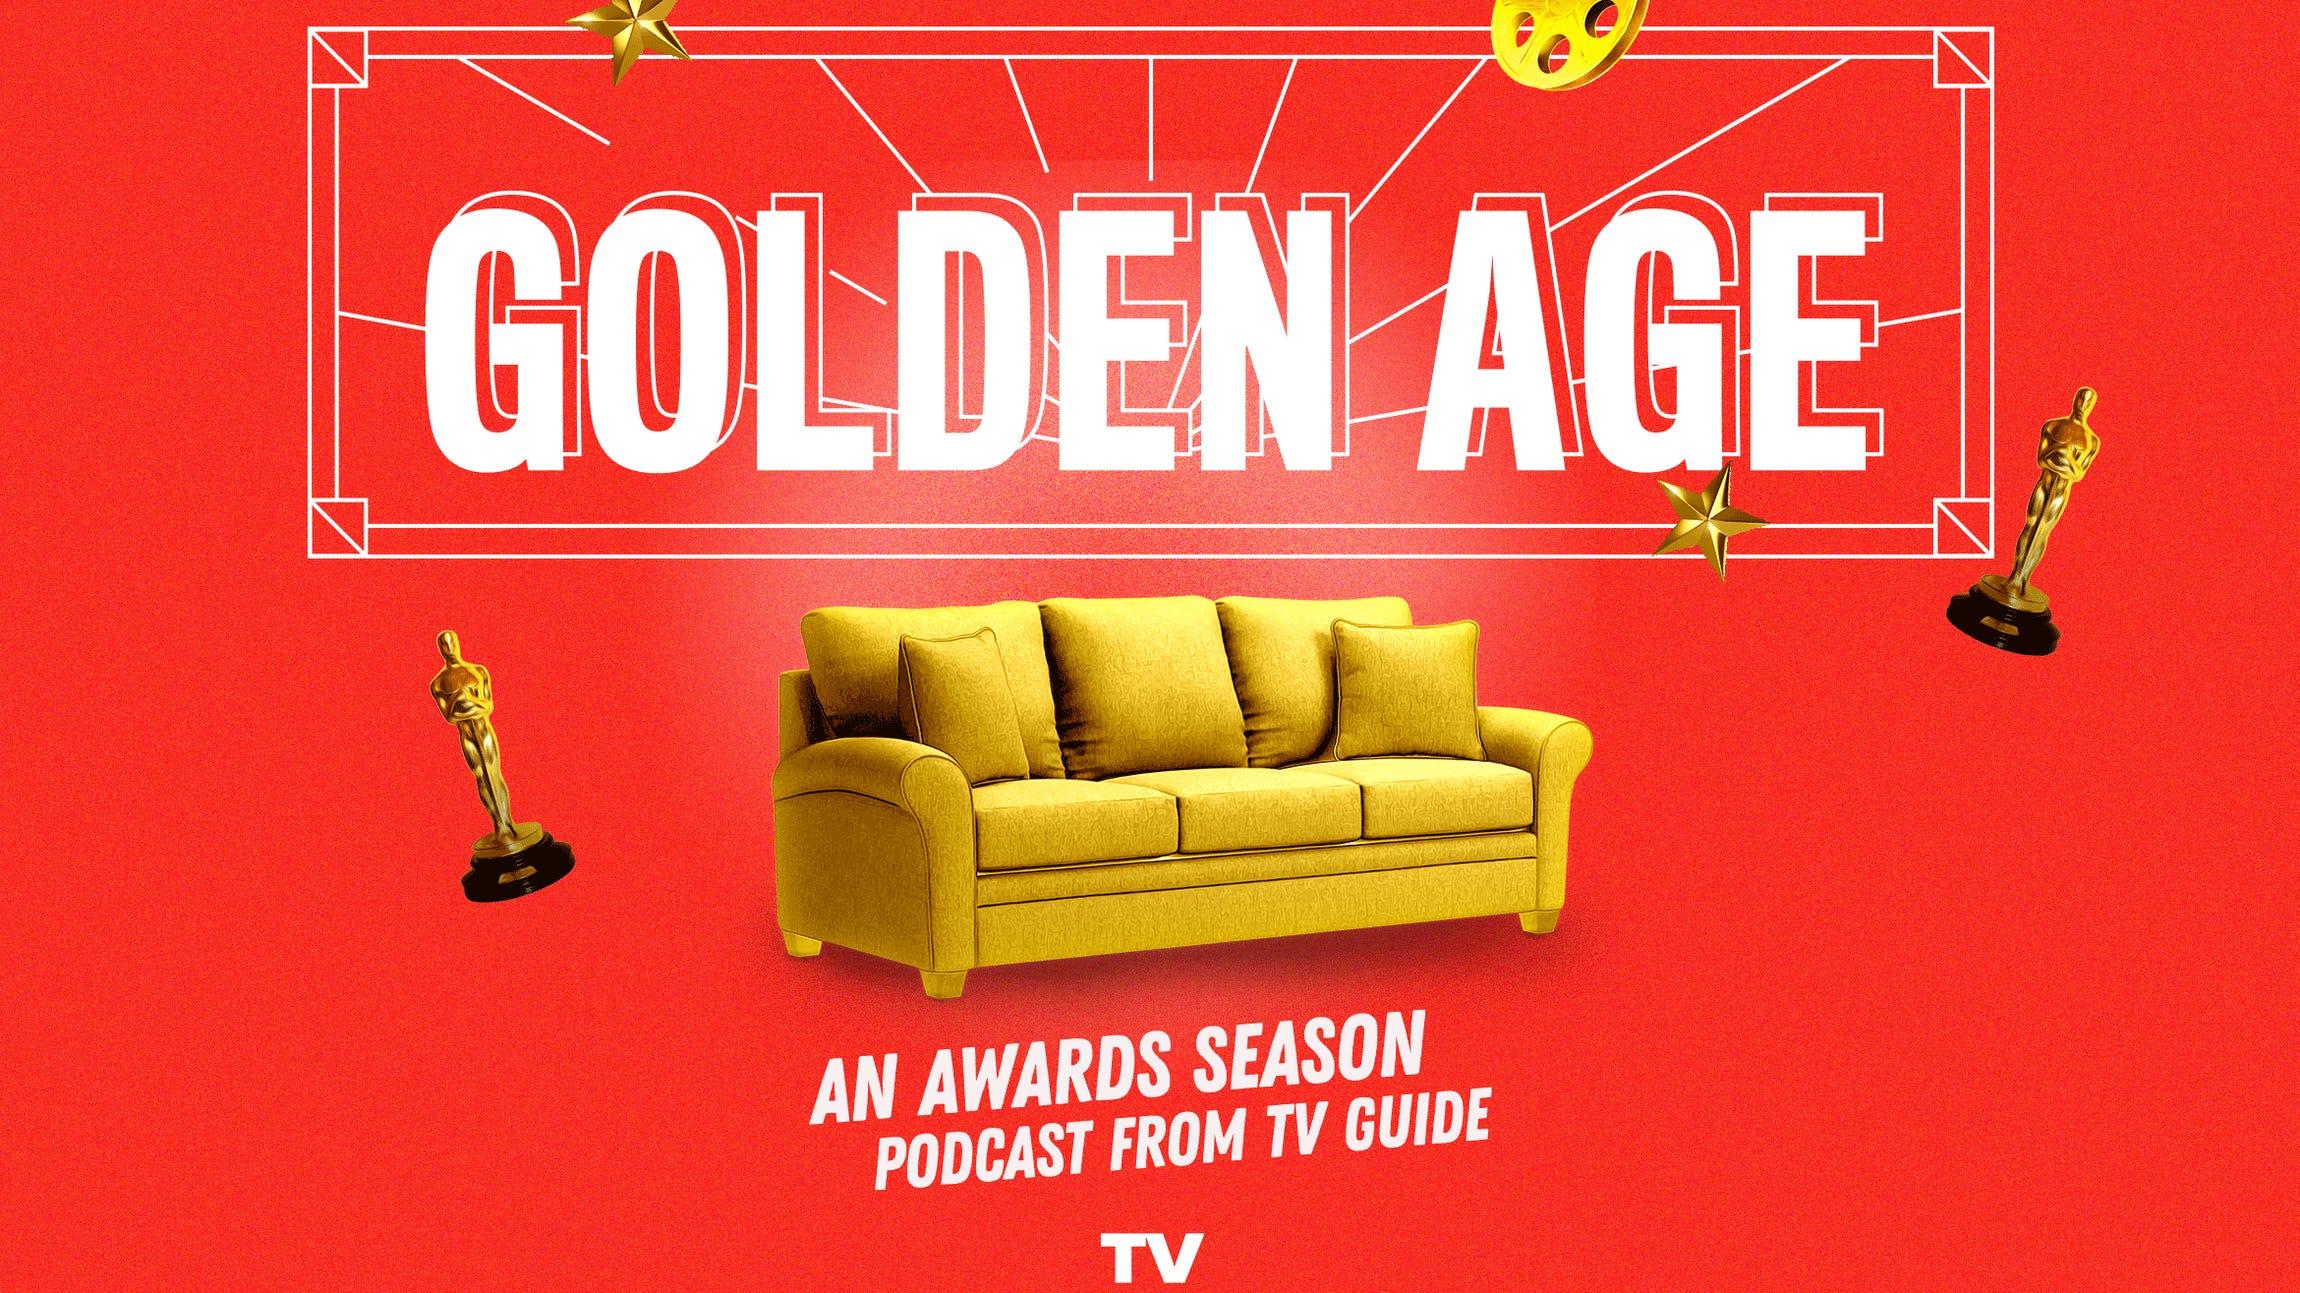 goldenage-2340x1575.png